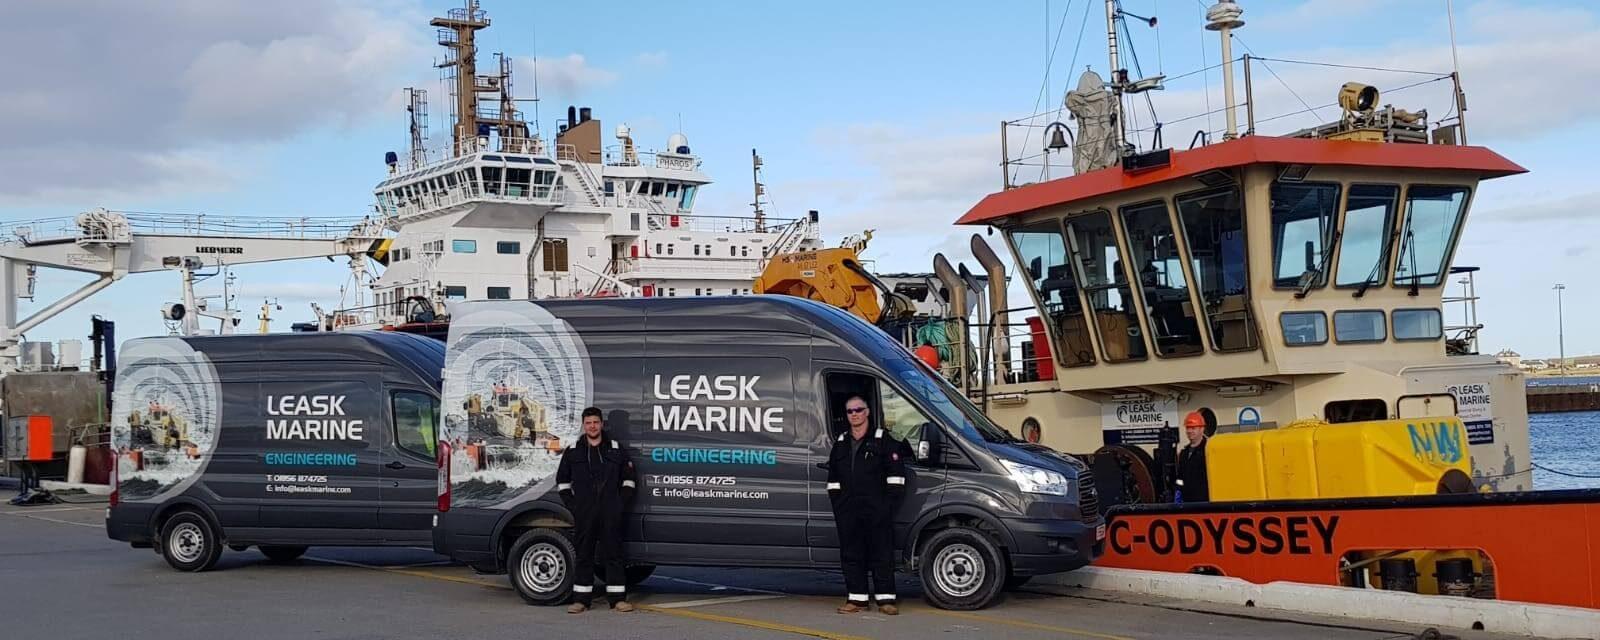 Leask Marine vans and C-Odyssey